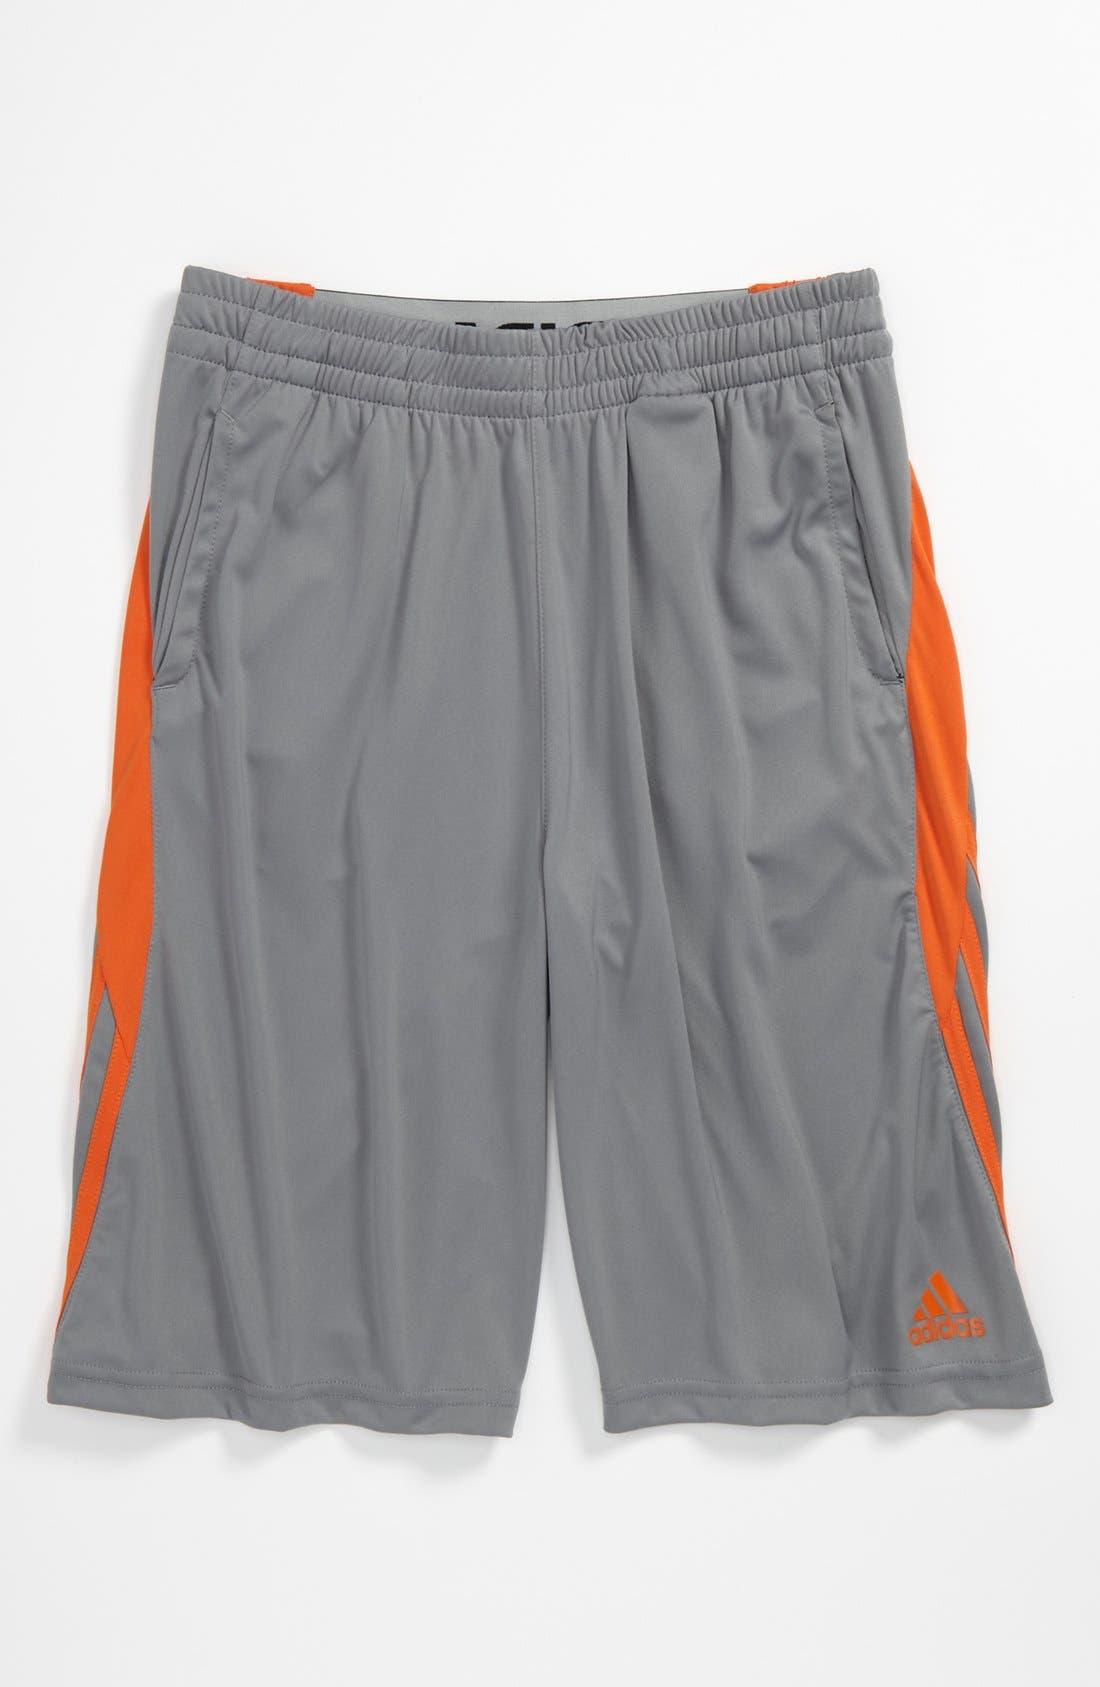 Alternate Image 1 Selected - adidas 'Ultimate Swat' Shorts (Big Boys)